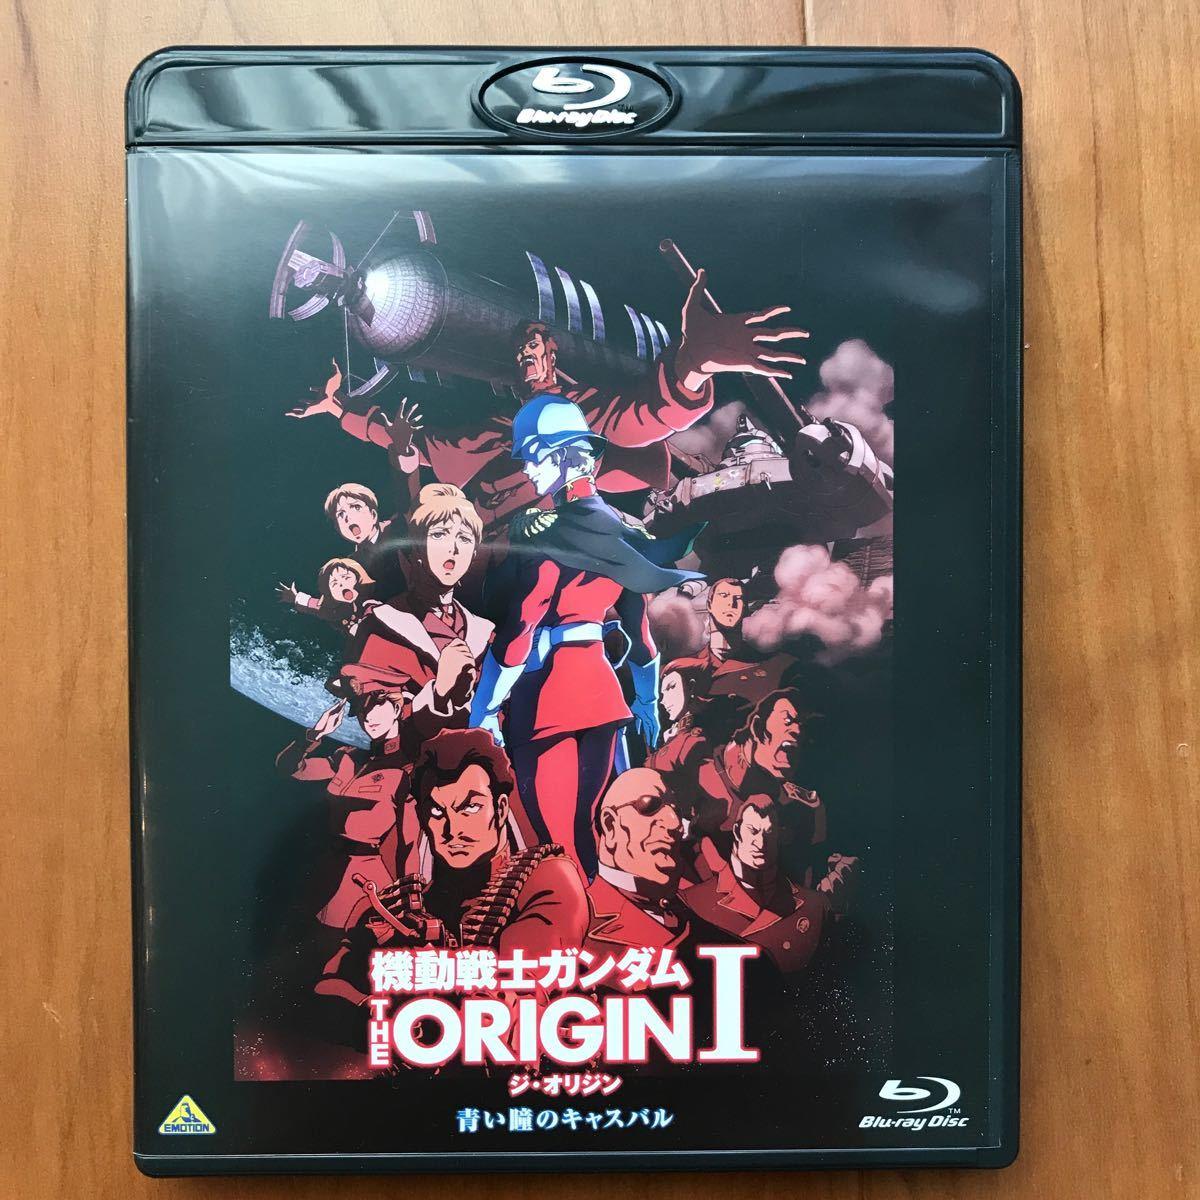 【Blu-ray】機動戦士ガンダム THE ORIGIN I 青い瞳のキャスバル